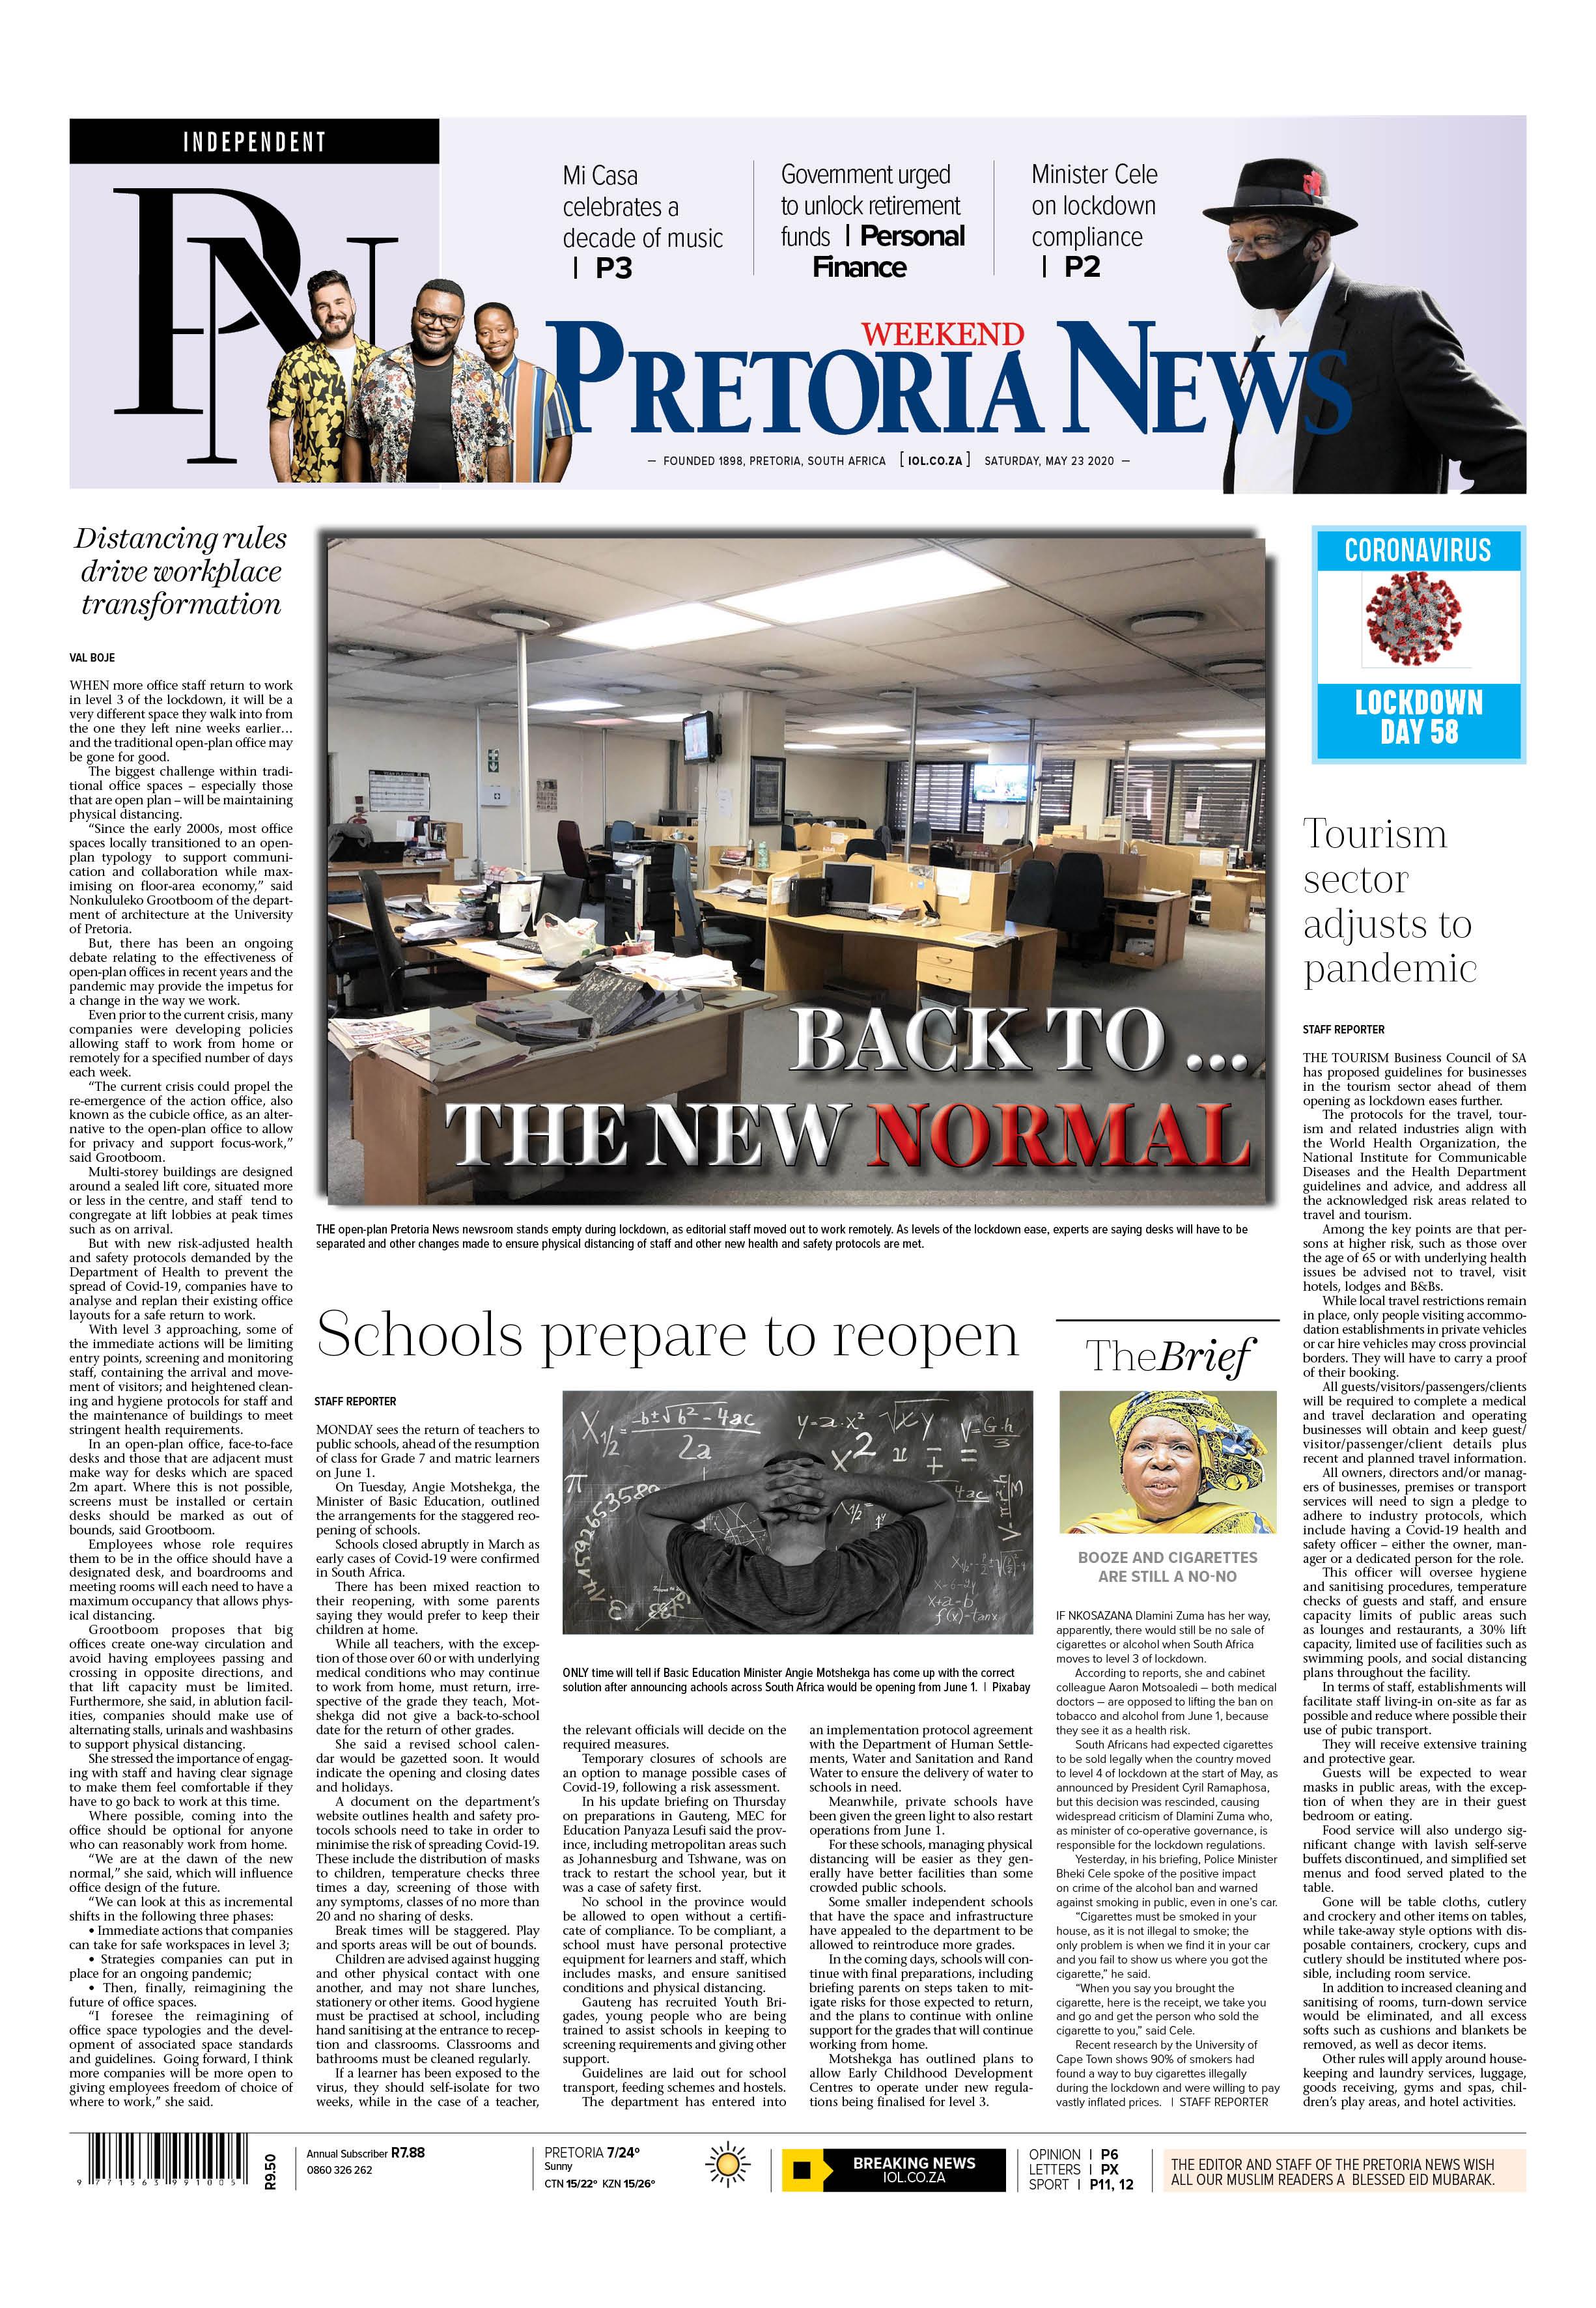 Pretoria News Weekend May 23 2020